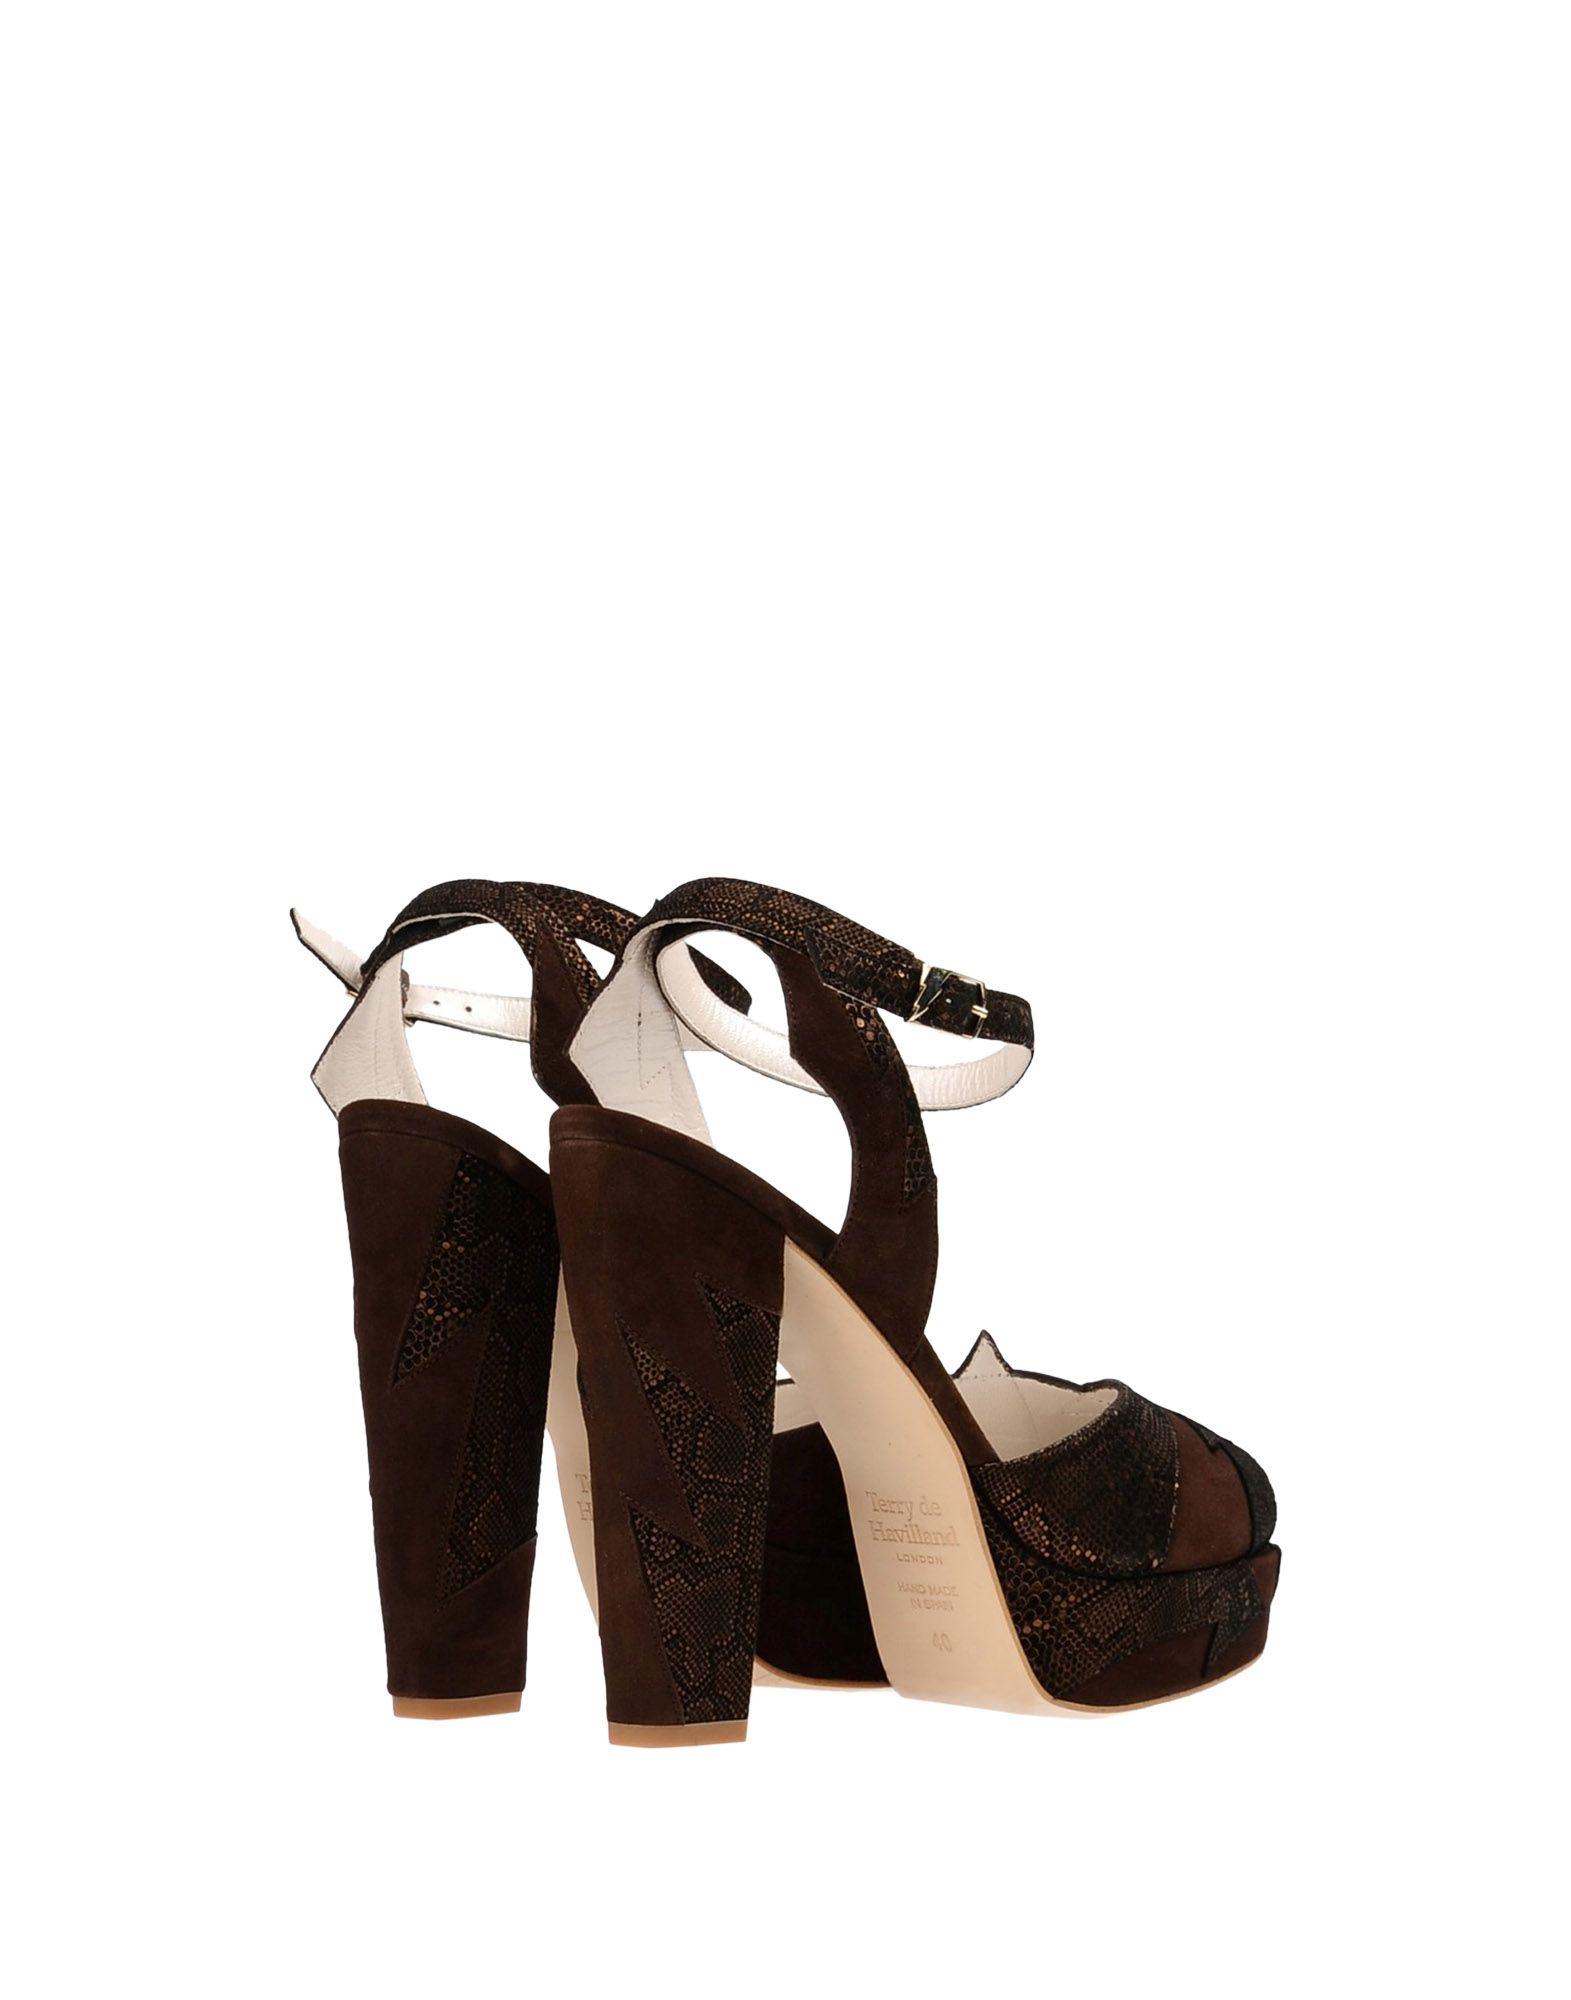 Terry De Havilland aussehende Sandalen Damen  11362701DOGut aussehende Havilland strapazierfähige Schuhe a88b74